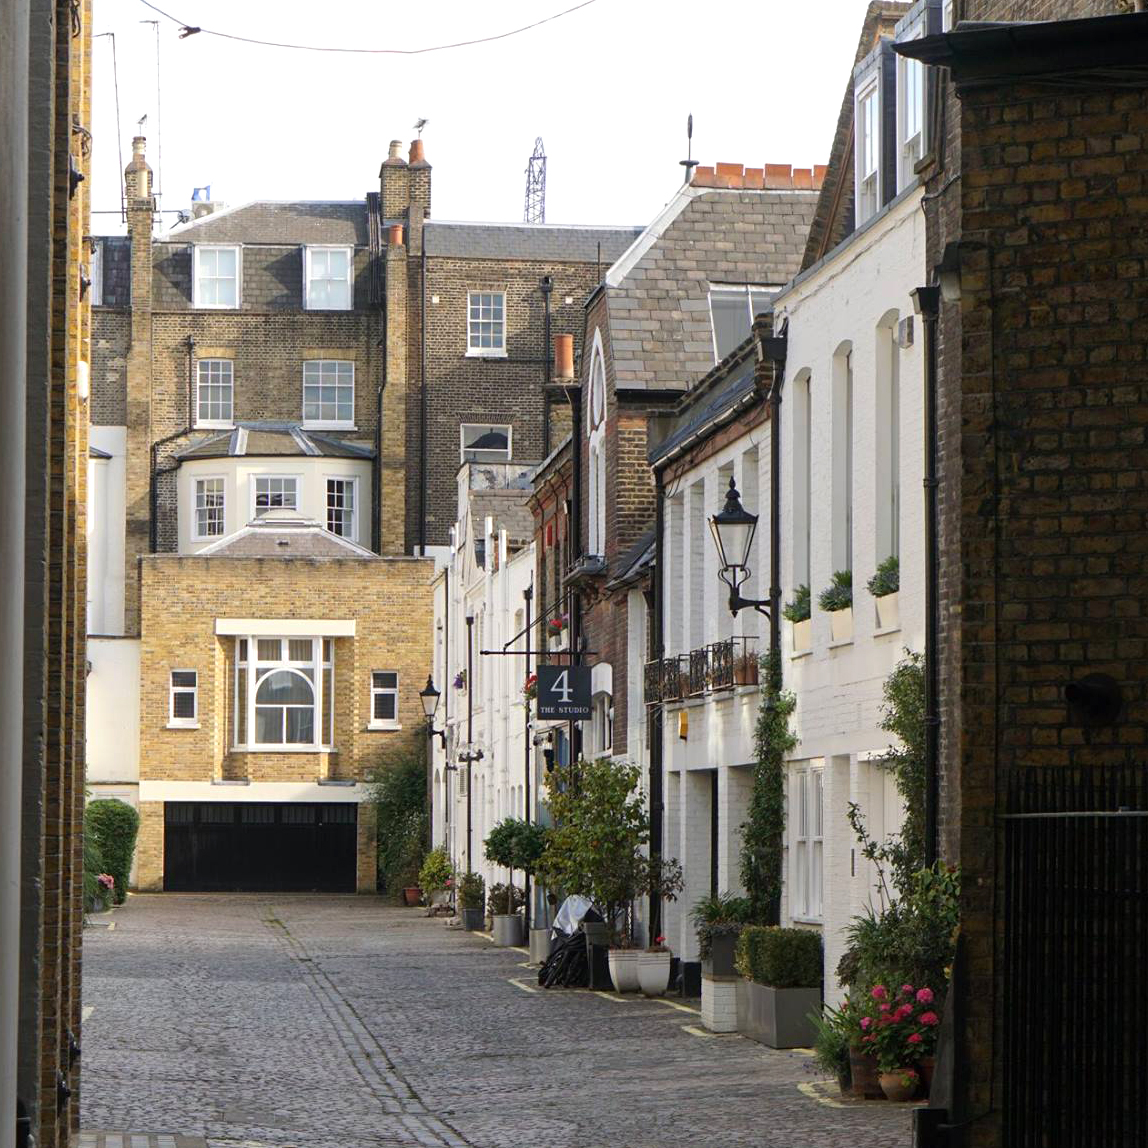 A charming London side street